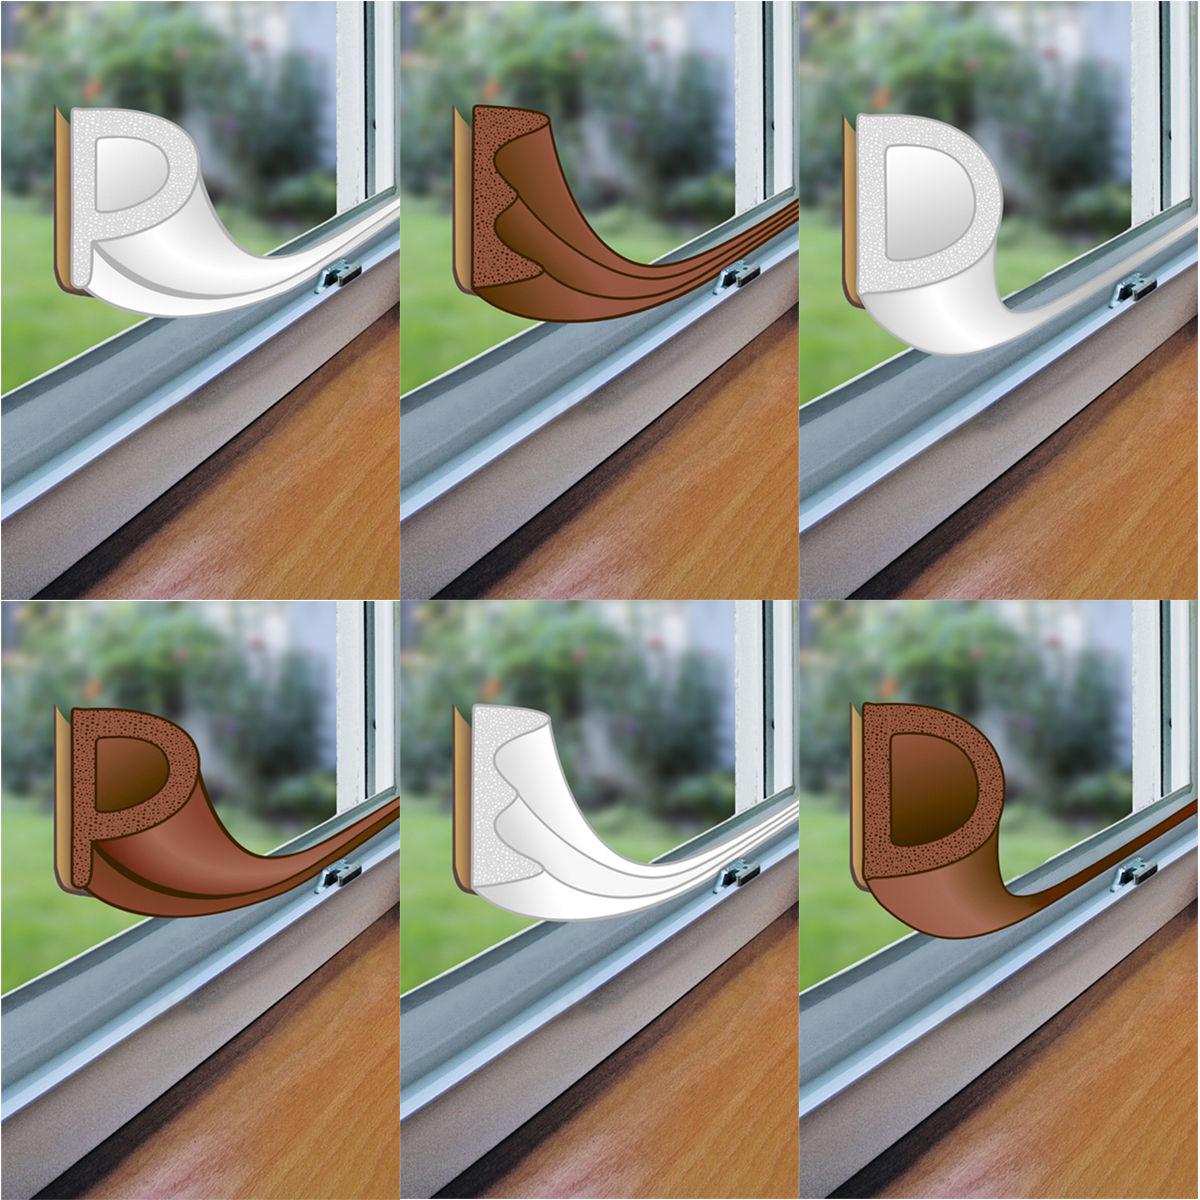 fensterdichtung gummidichtung e p d profil dichtband selbstklebend dichtungsband ebay. Black Bedroom Furniture Sets. Home Design Ideas